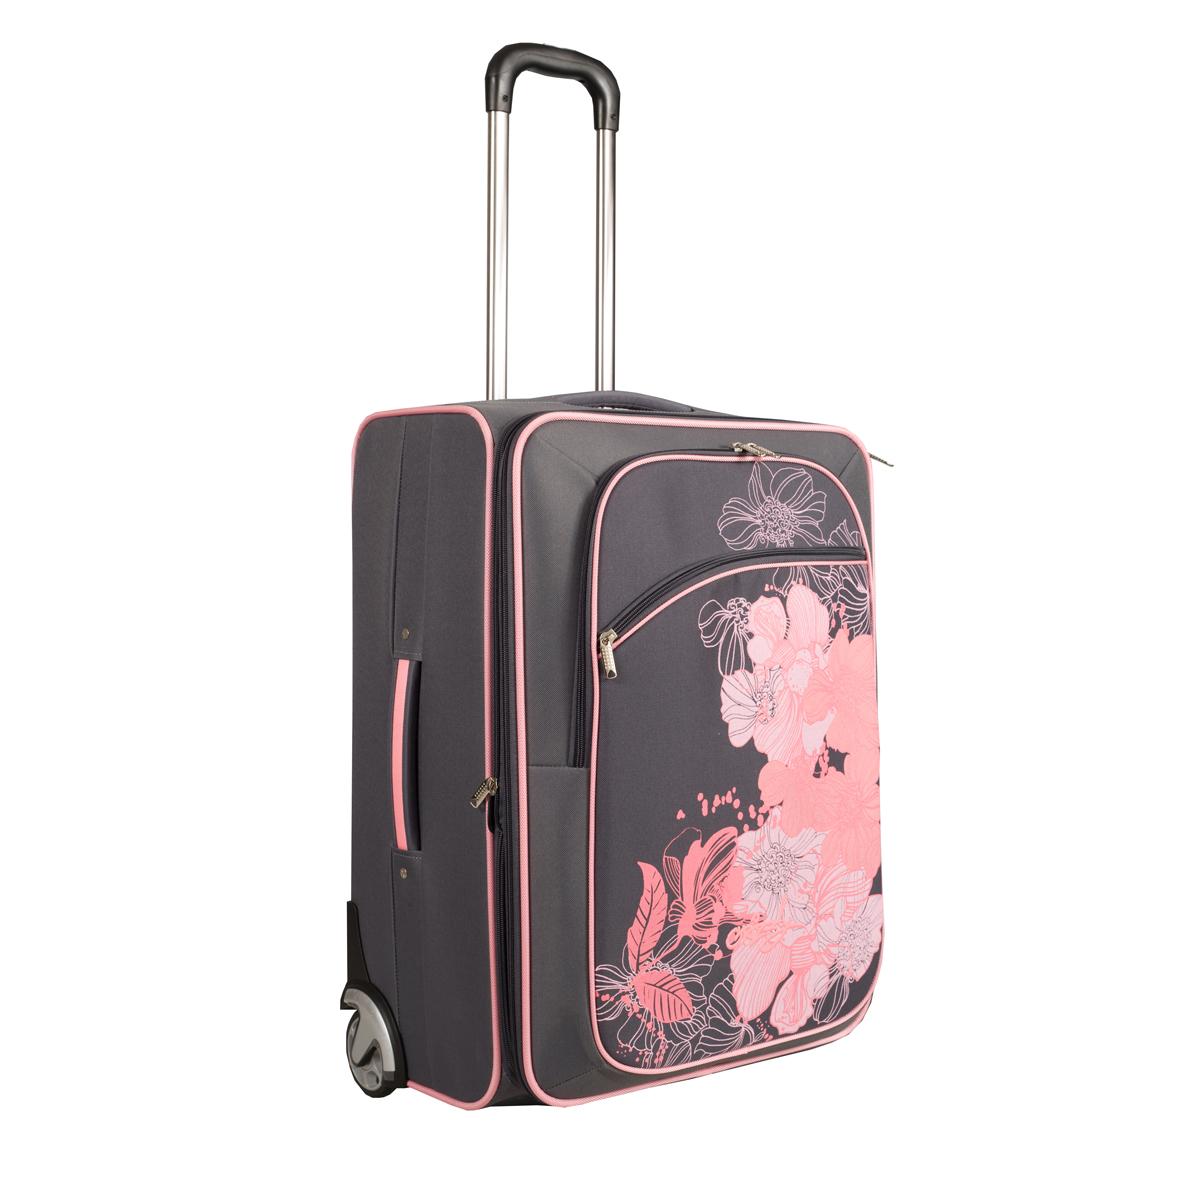 d72b17c3 Новая коллекция: чемоданы Grizzly